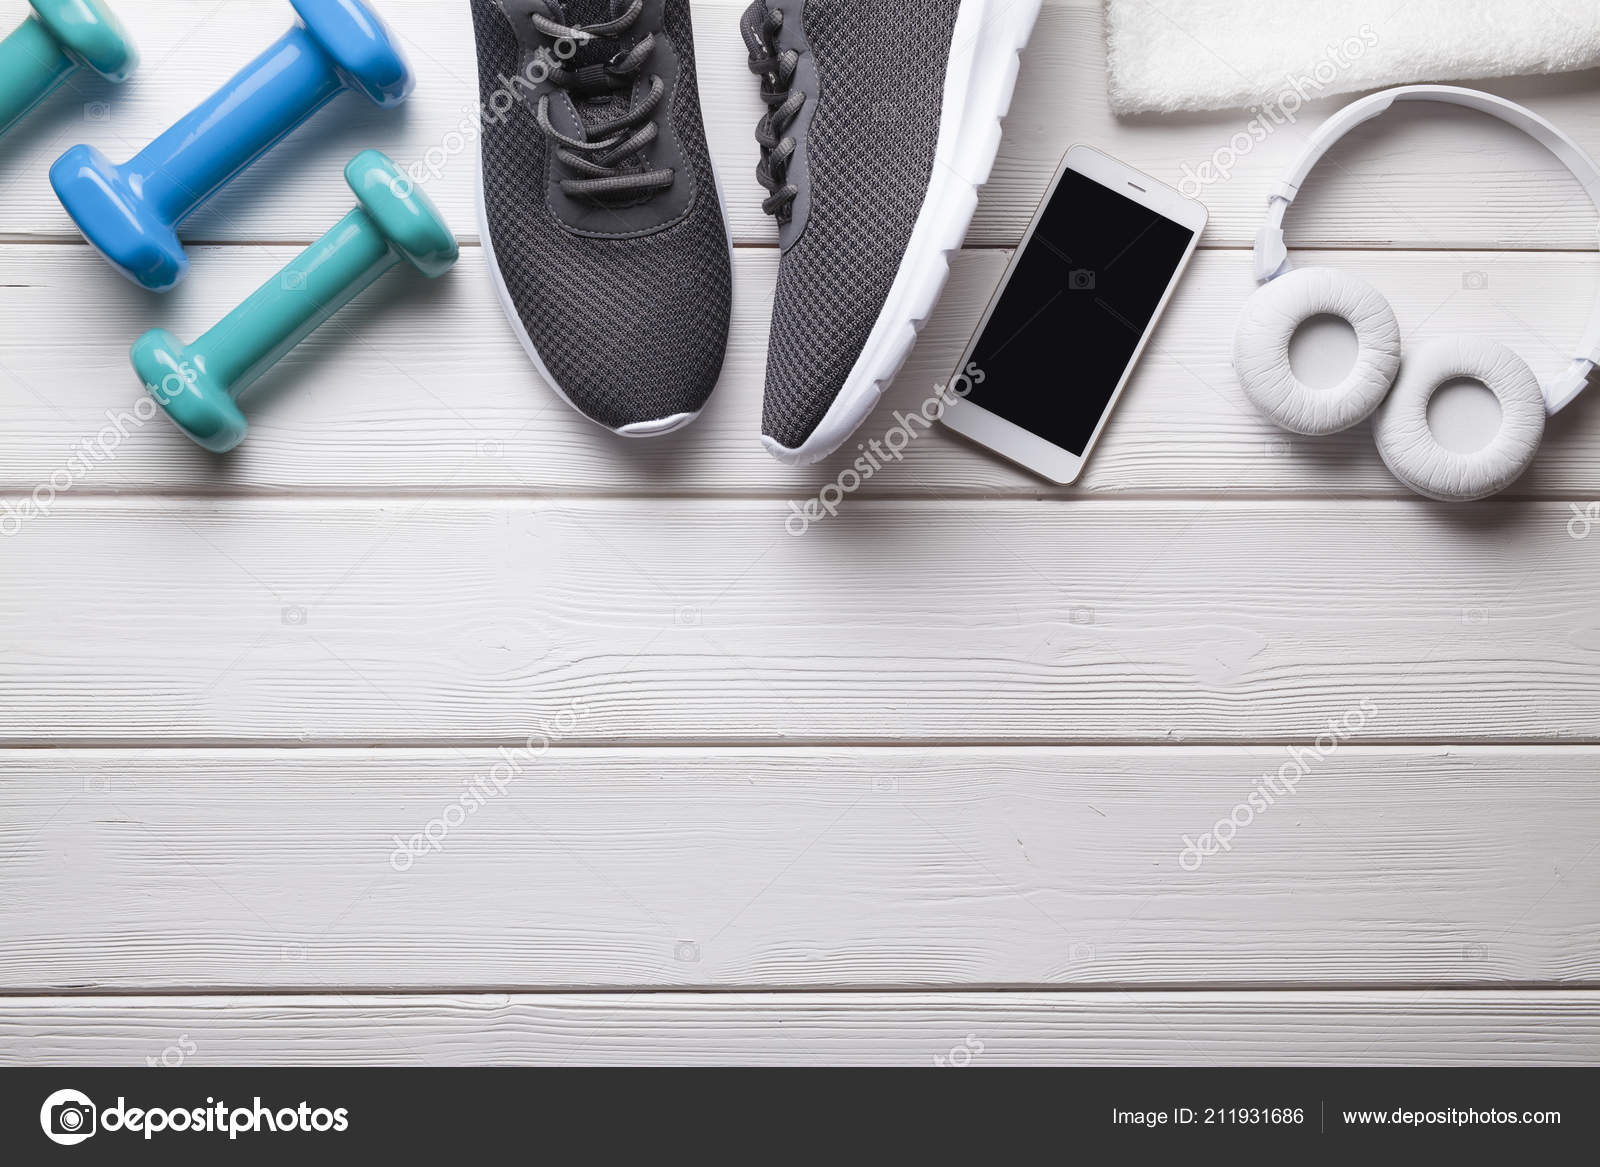 0a296d8d71e Όργανα Γυμναστικής Αθλητικά Παπούτσια Αλτήρες Πετσέτα Και Smartphone  Ακουστικά Φόντο — Φωτογραφία Αρχείου